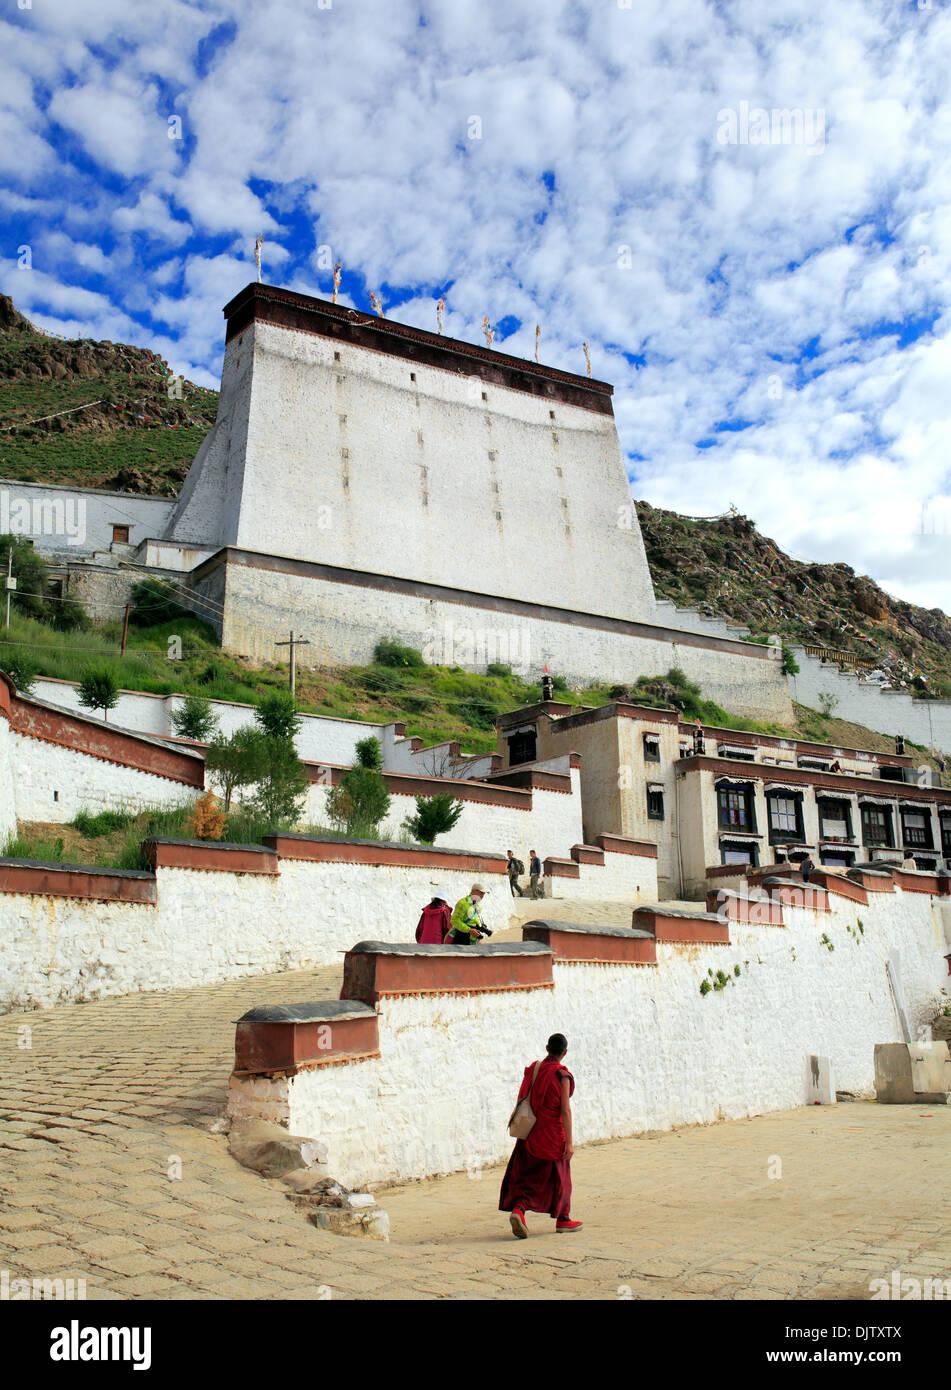 Tashilhunpo monastery, Shigatse, Tibet, China - Stock Image